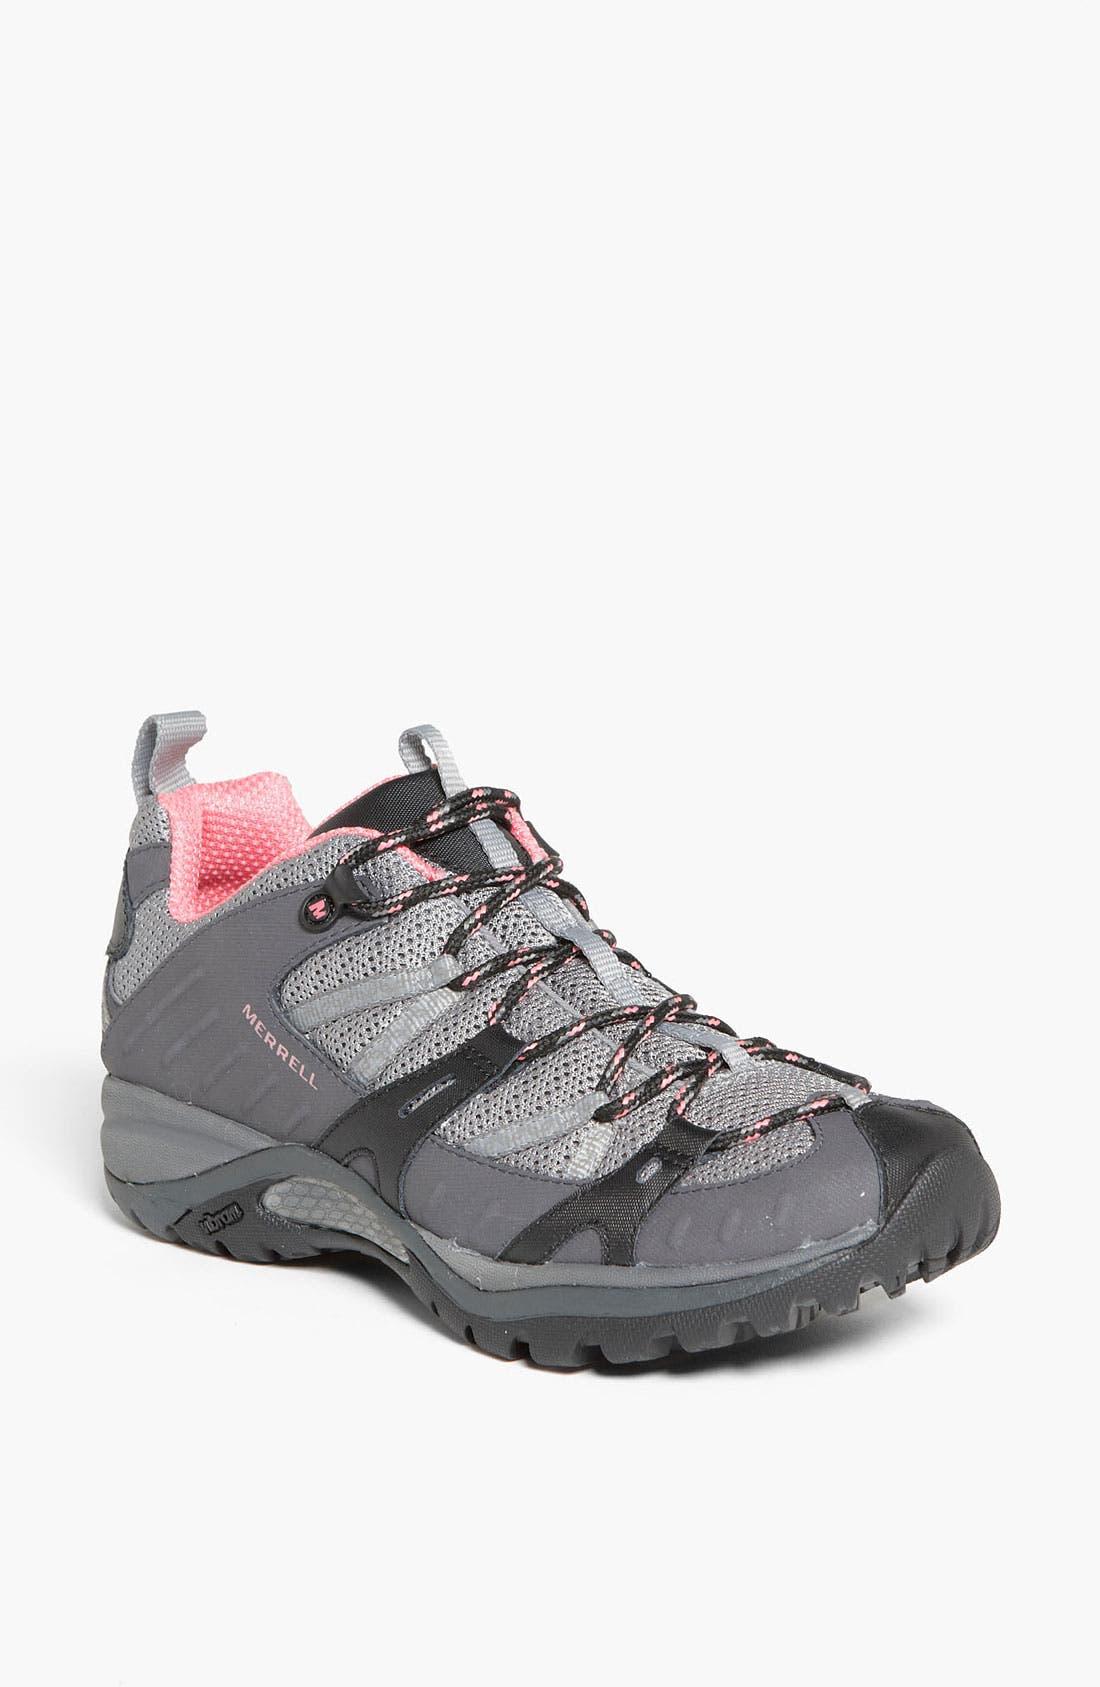 Alternate Image 1 Selected - Merrell 'Siren Sport 2' Walking Shoe (Women)